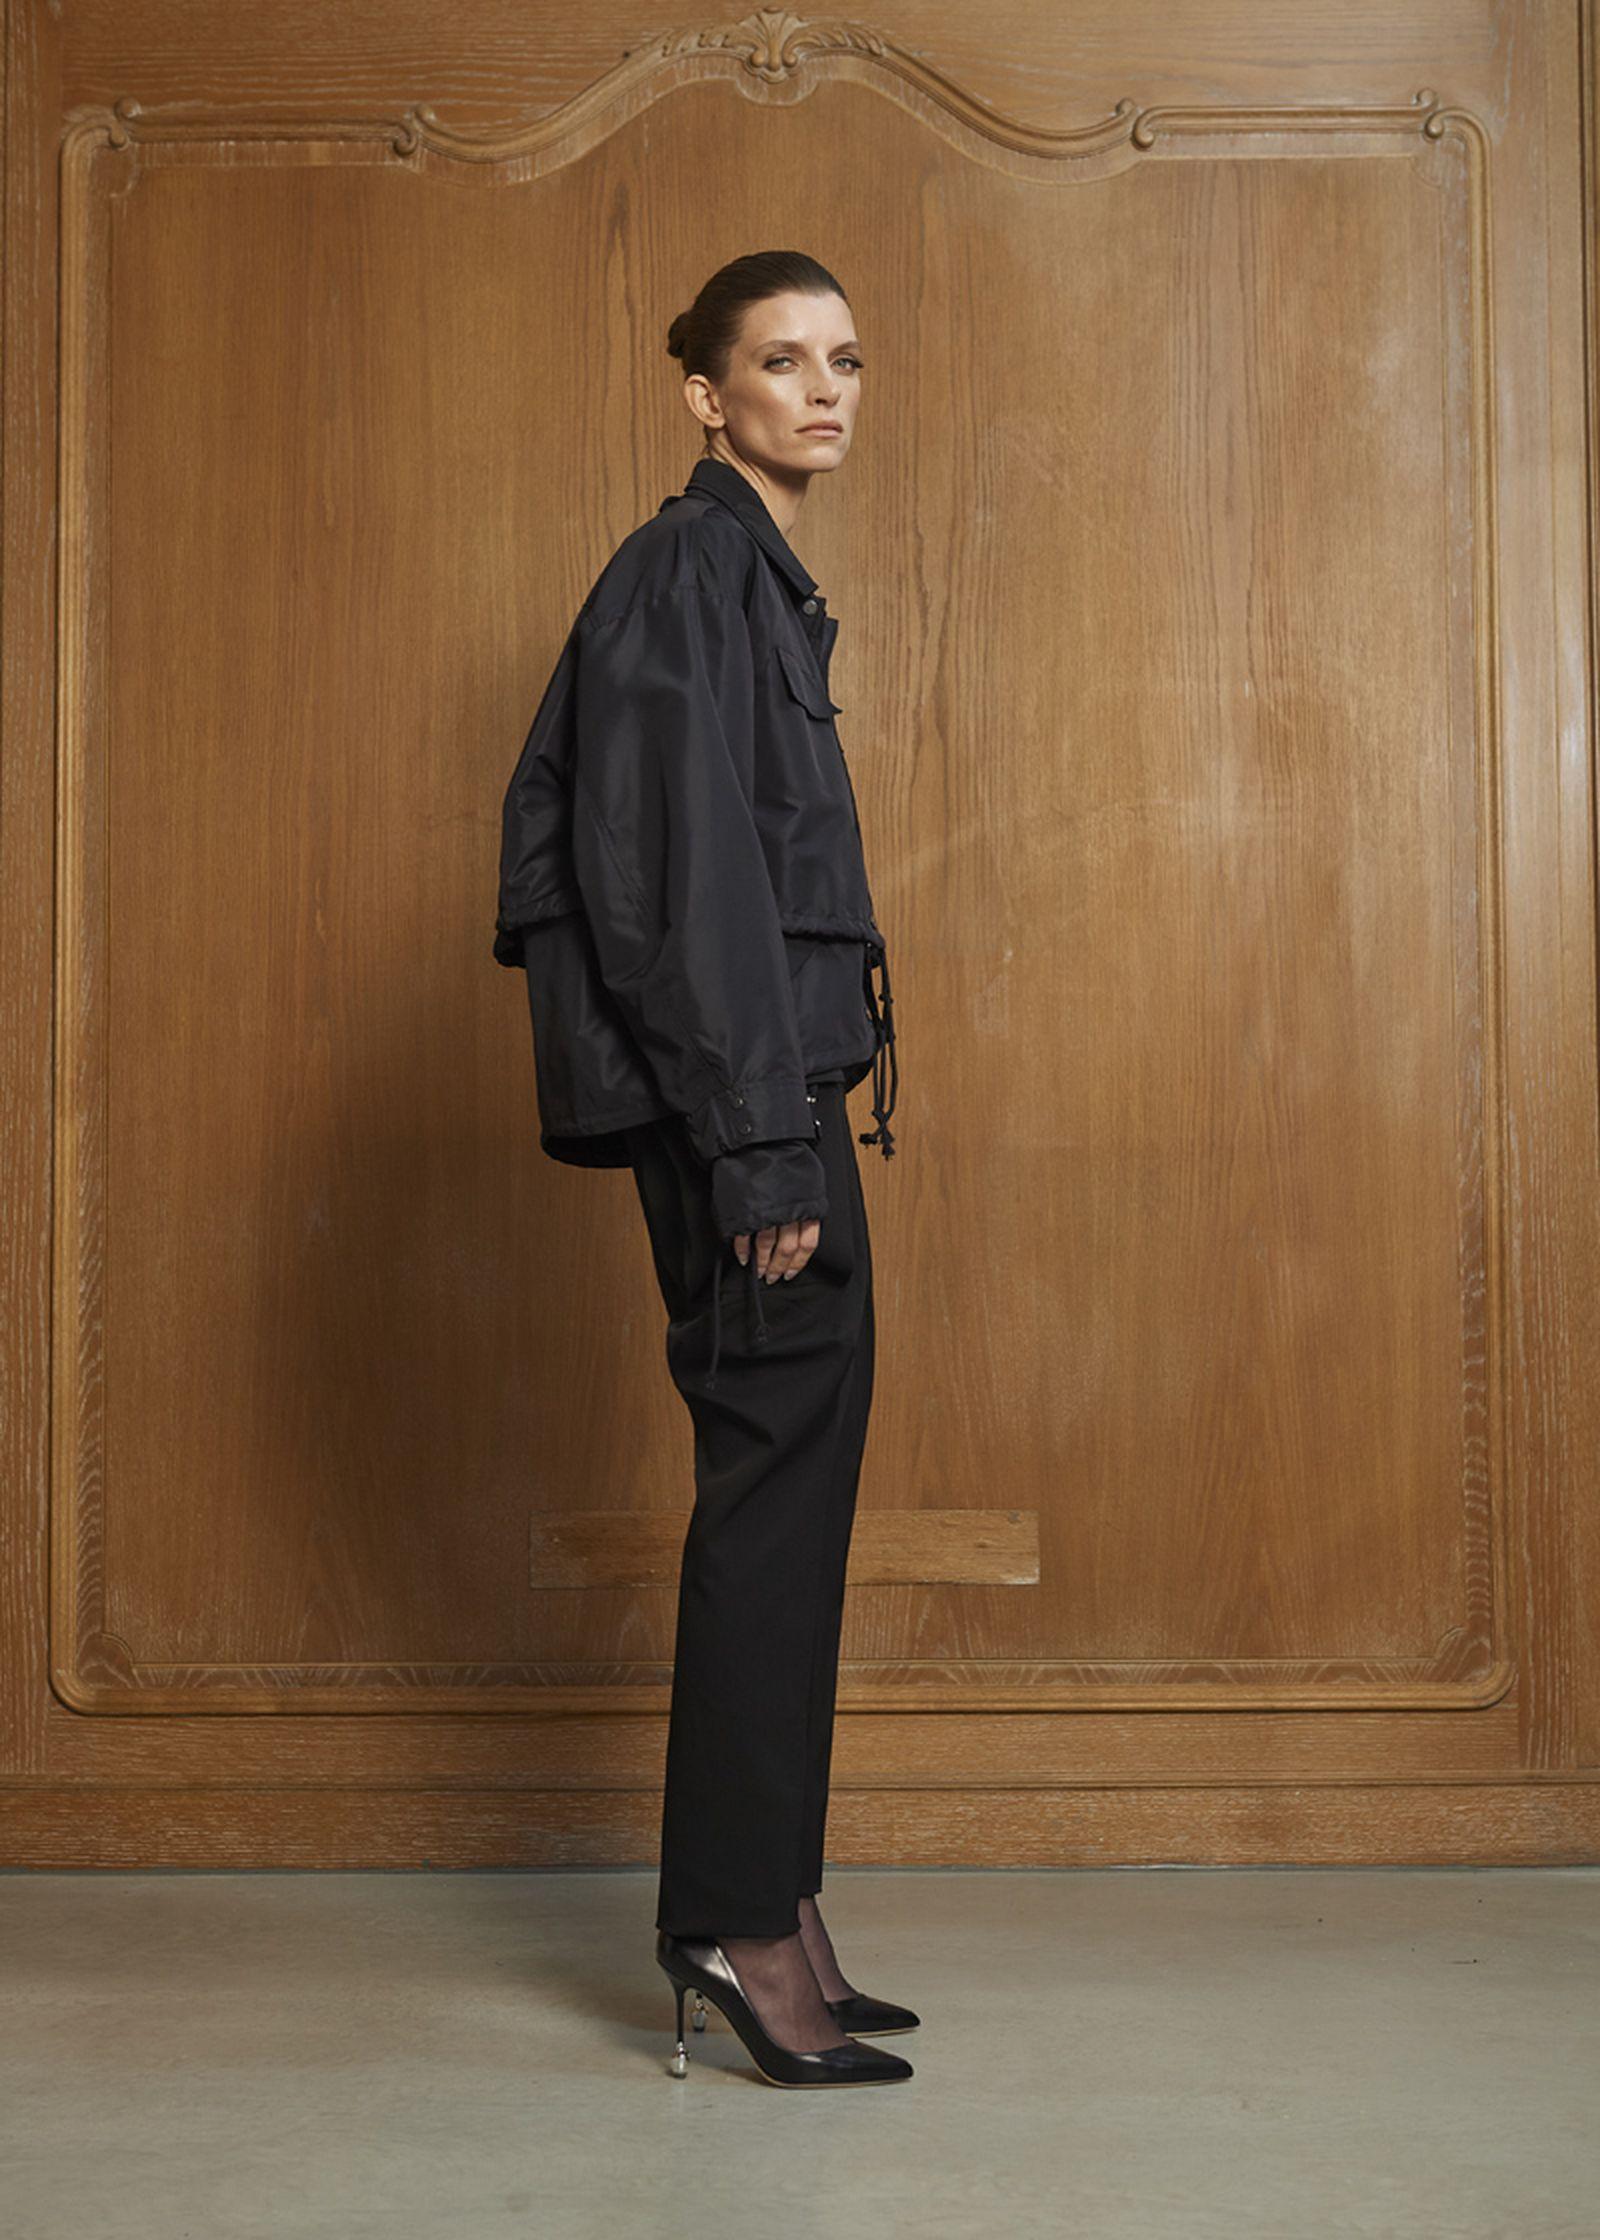 032c-rtw-womenswear-collection-paris-6